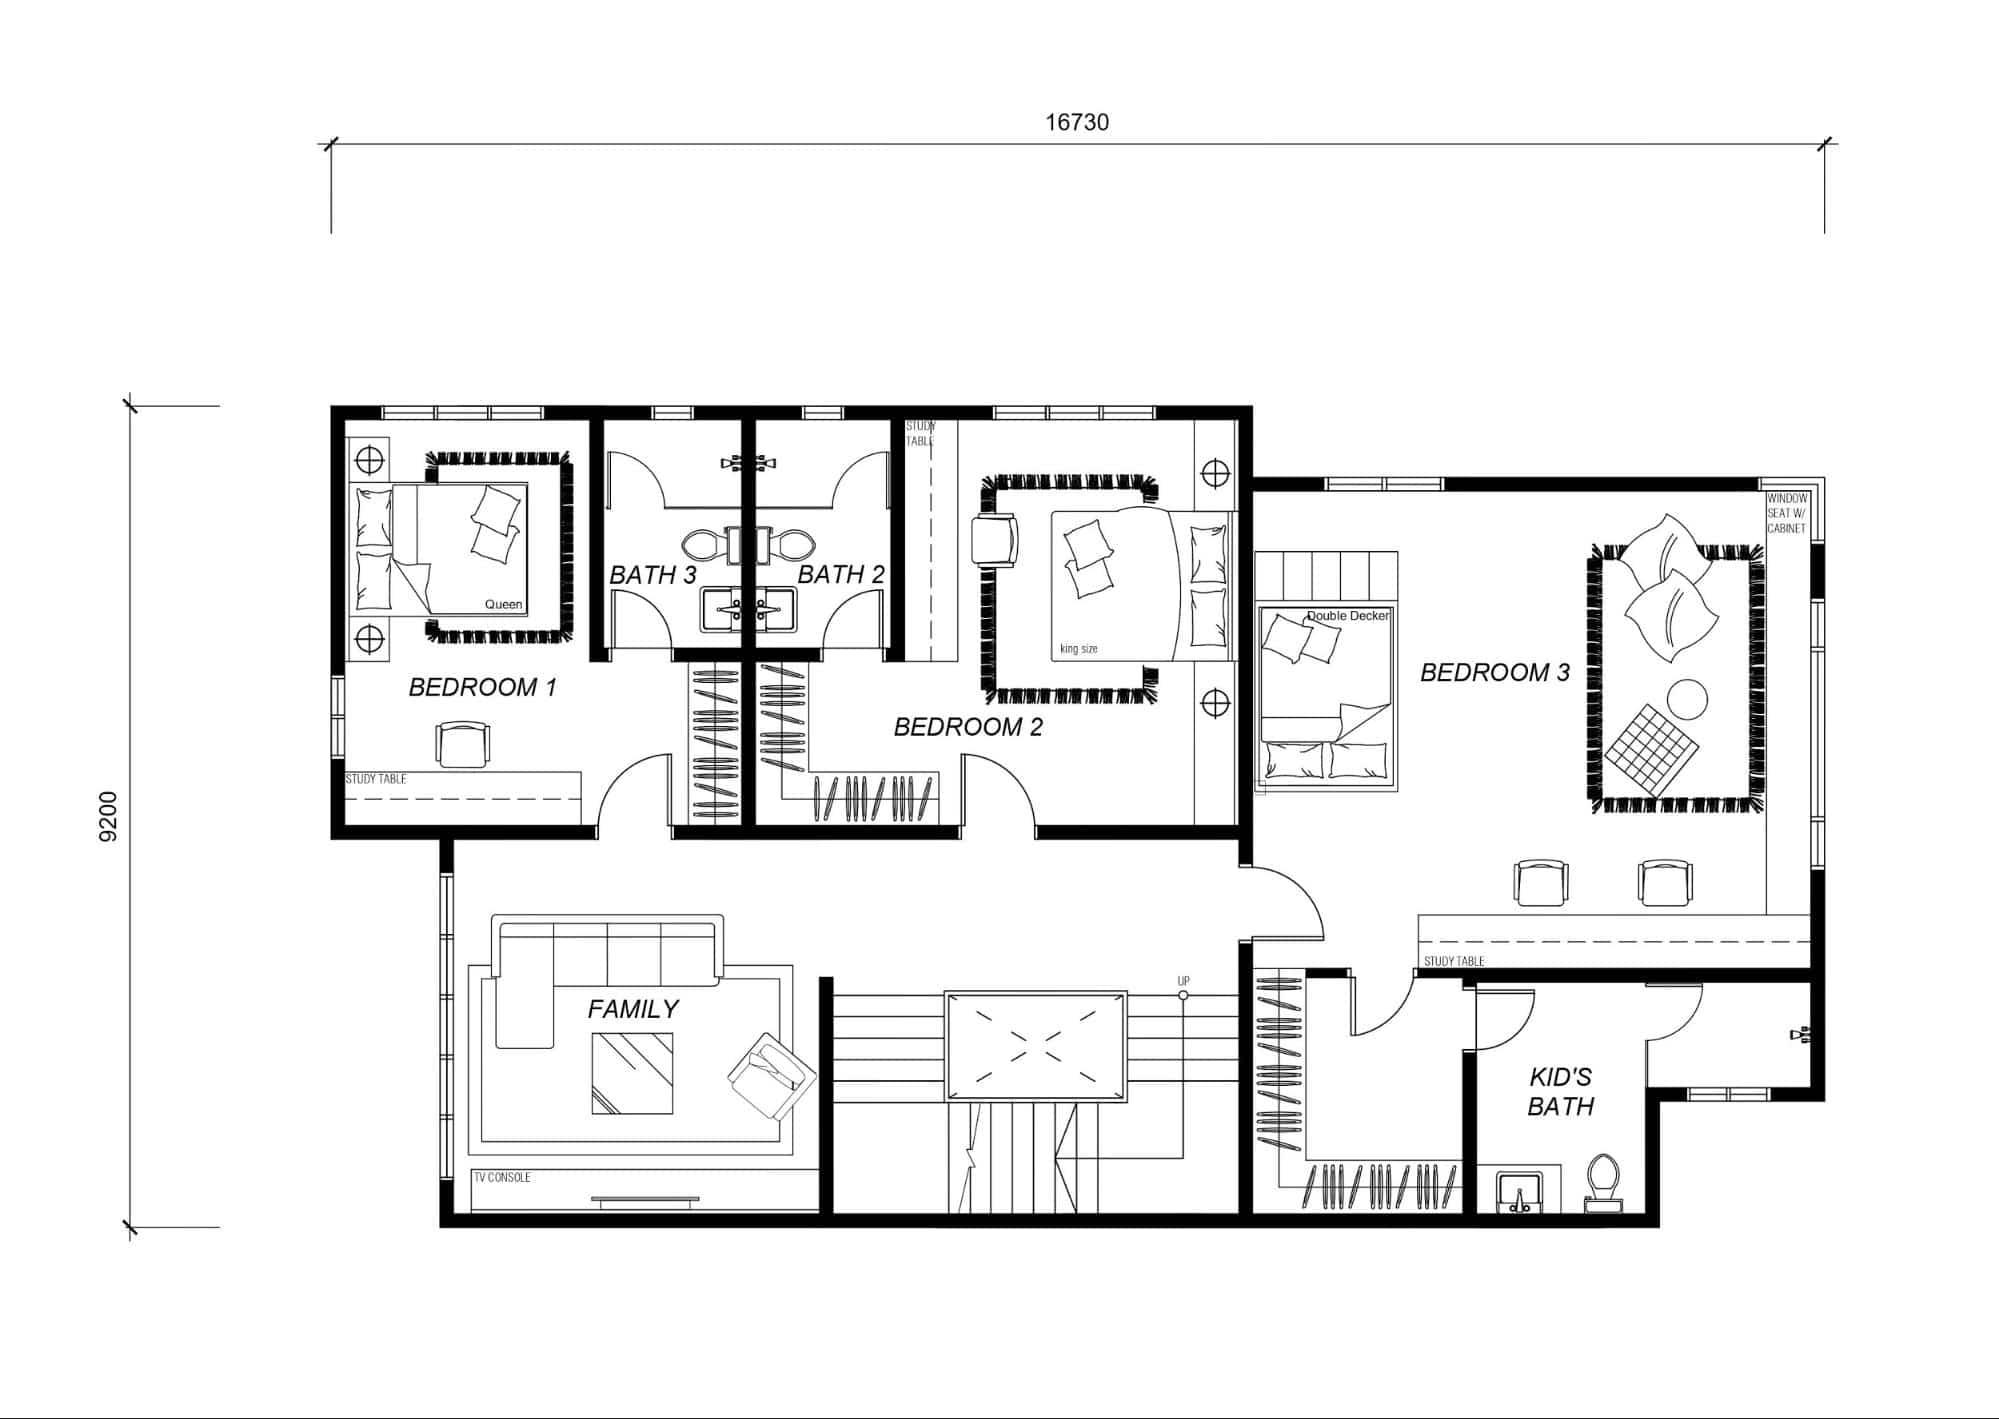 First floor layout Ambang Botanic 2